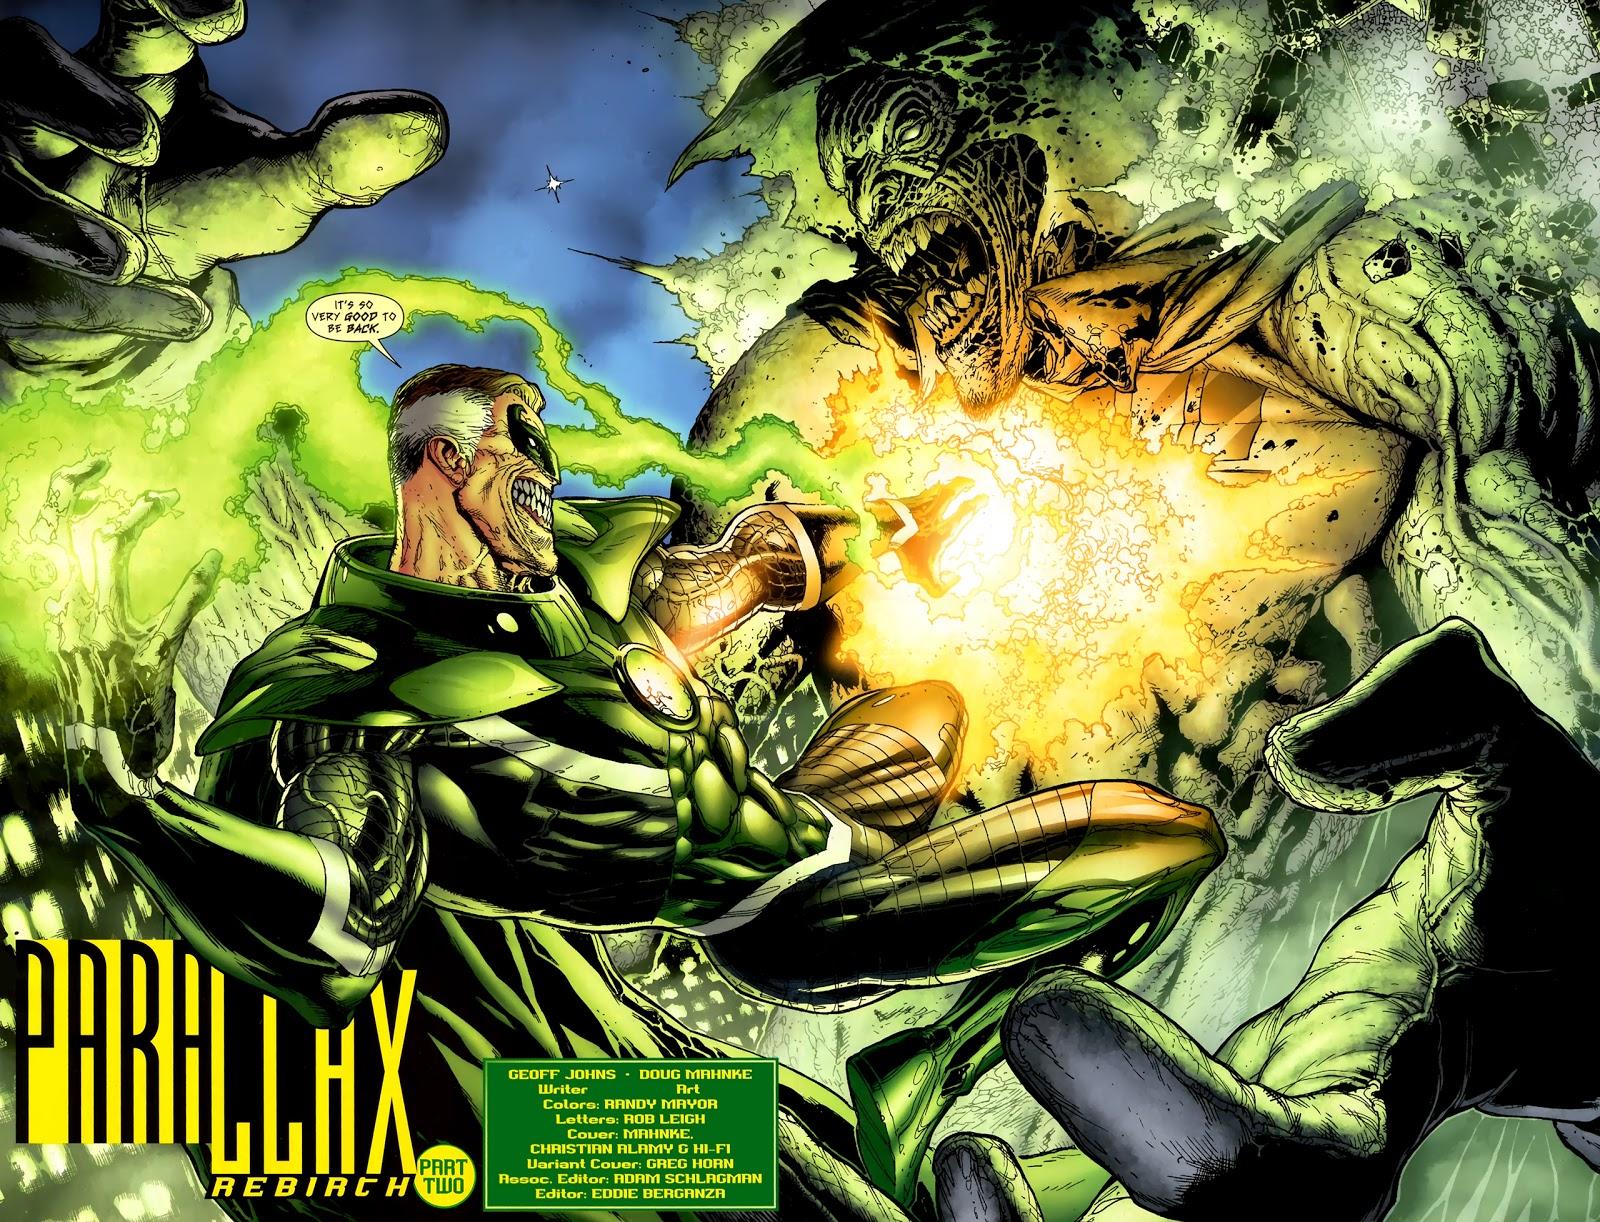 Parallax-Hal Jordan VS Black Lantern Spectre